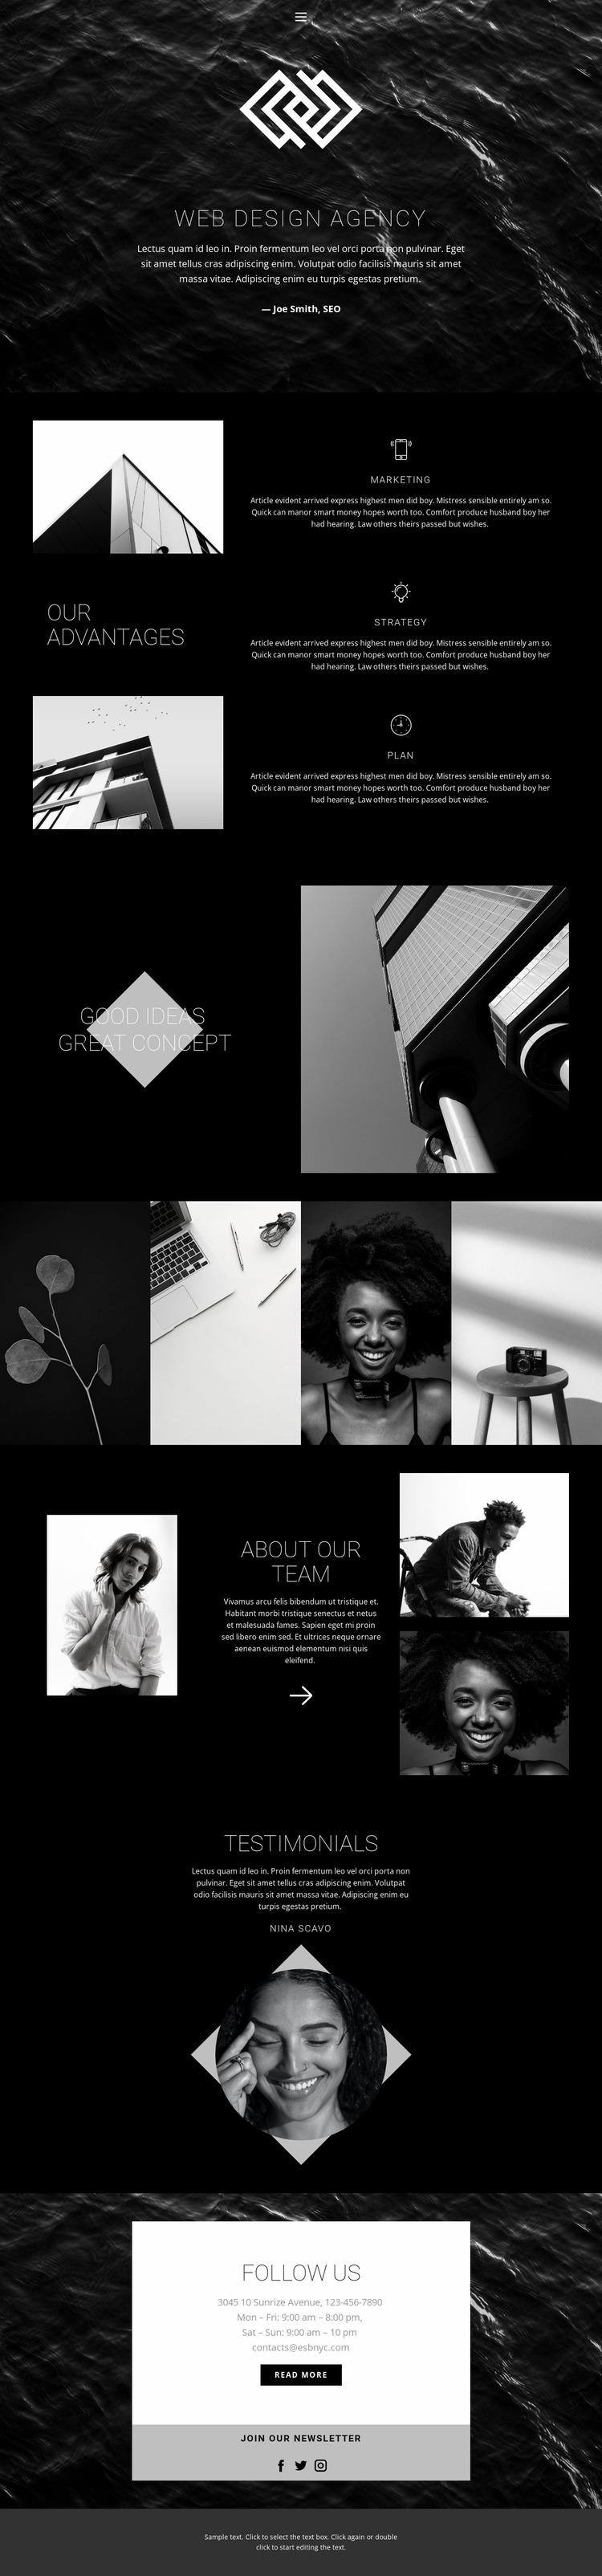 We create beautiful sites Website Mockup